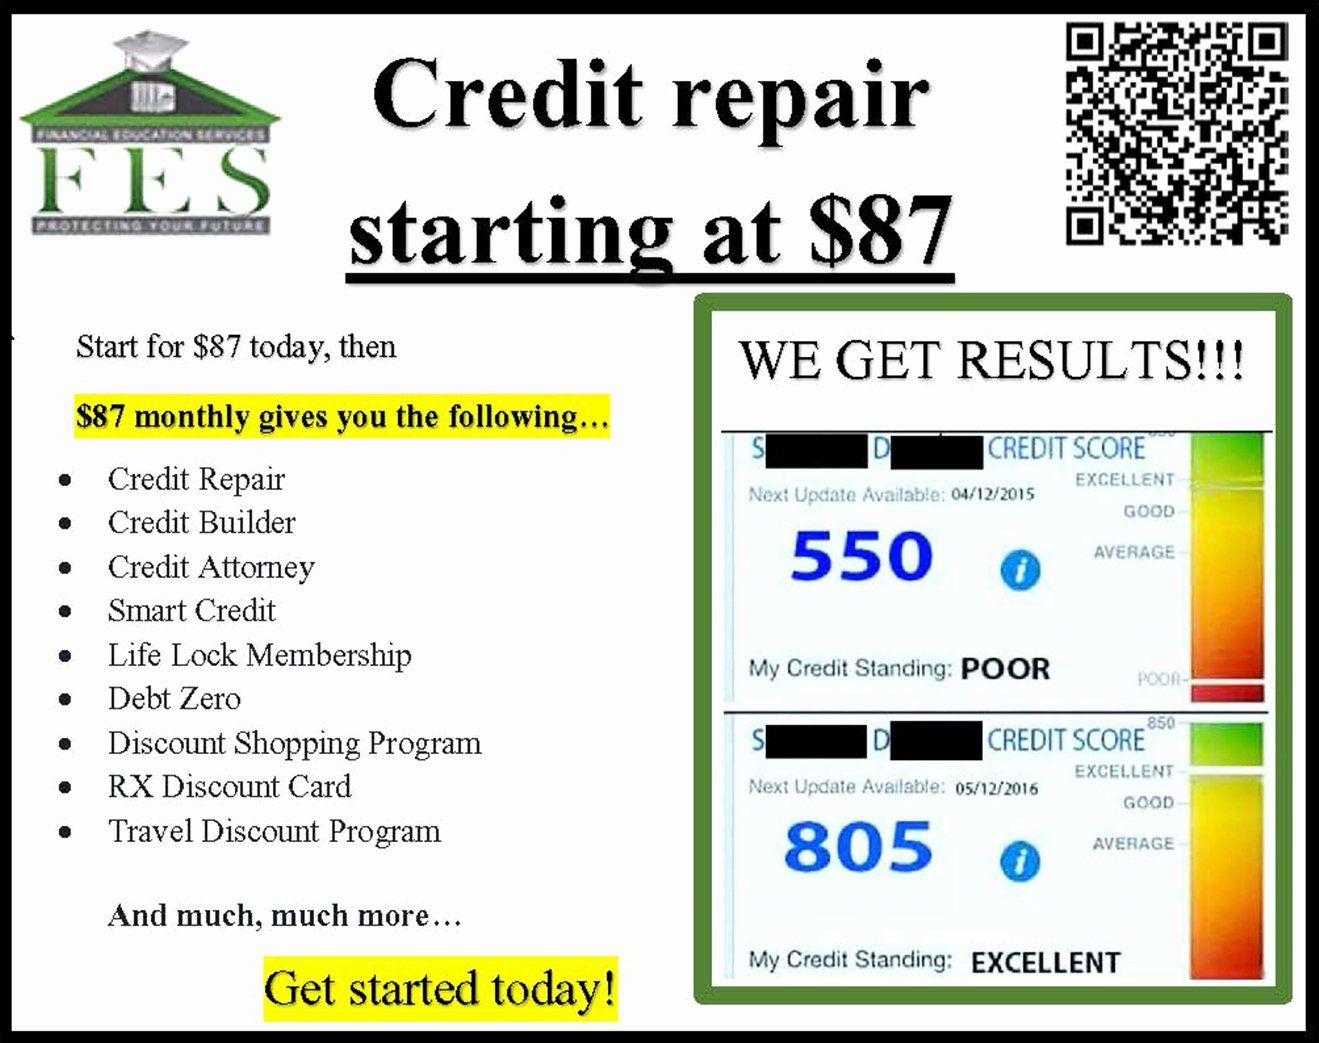 Credit Repair Flyer Template Luxury Credit Repair Flyers